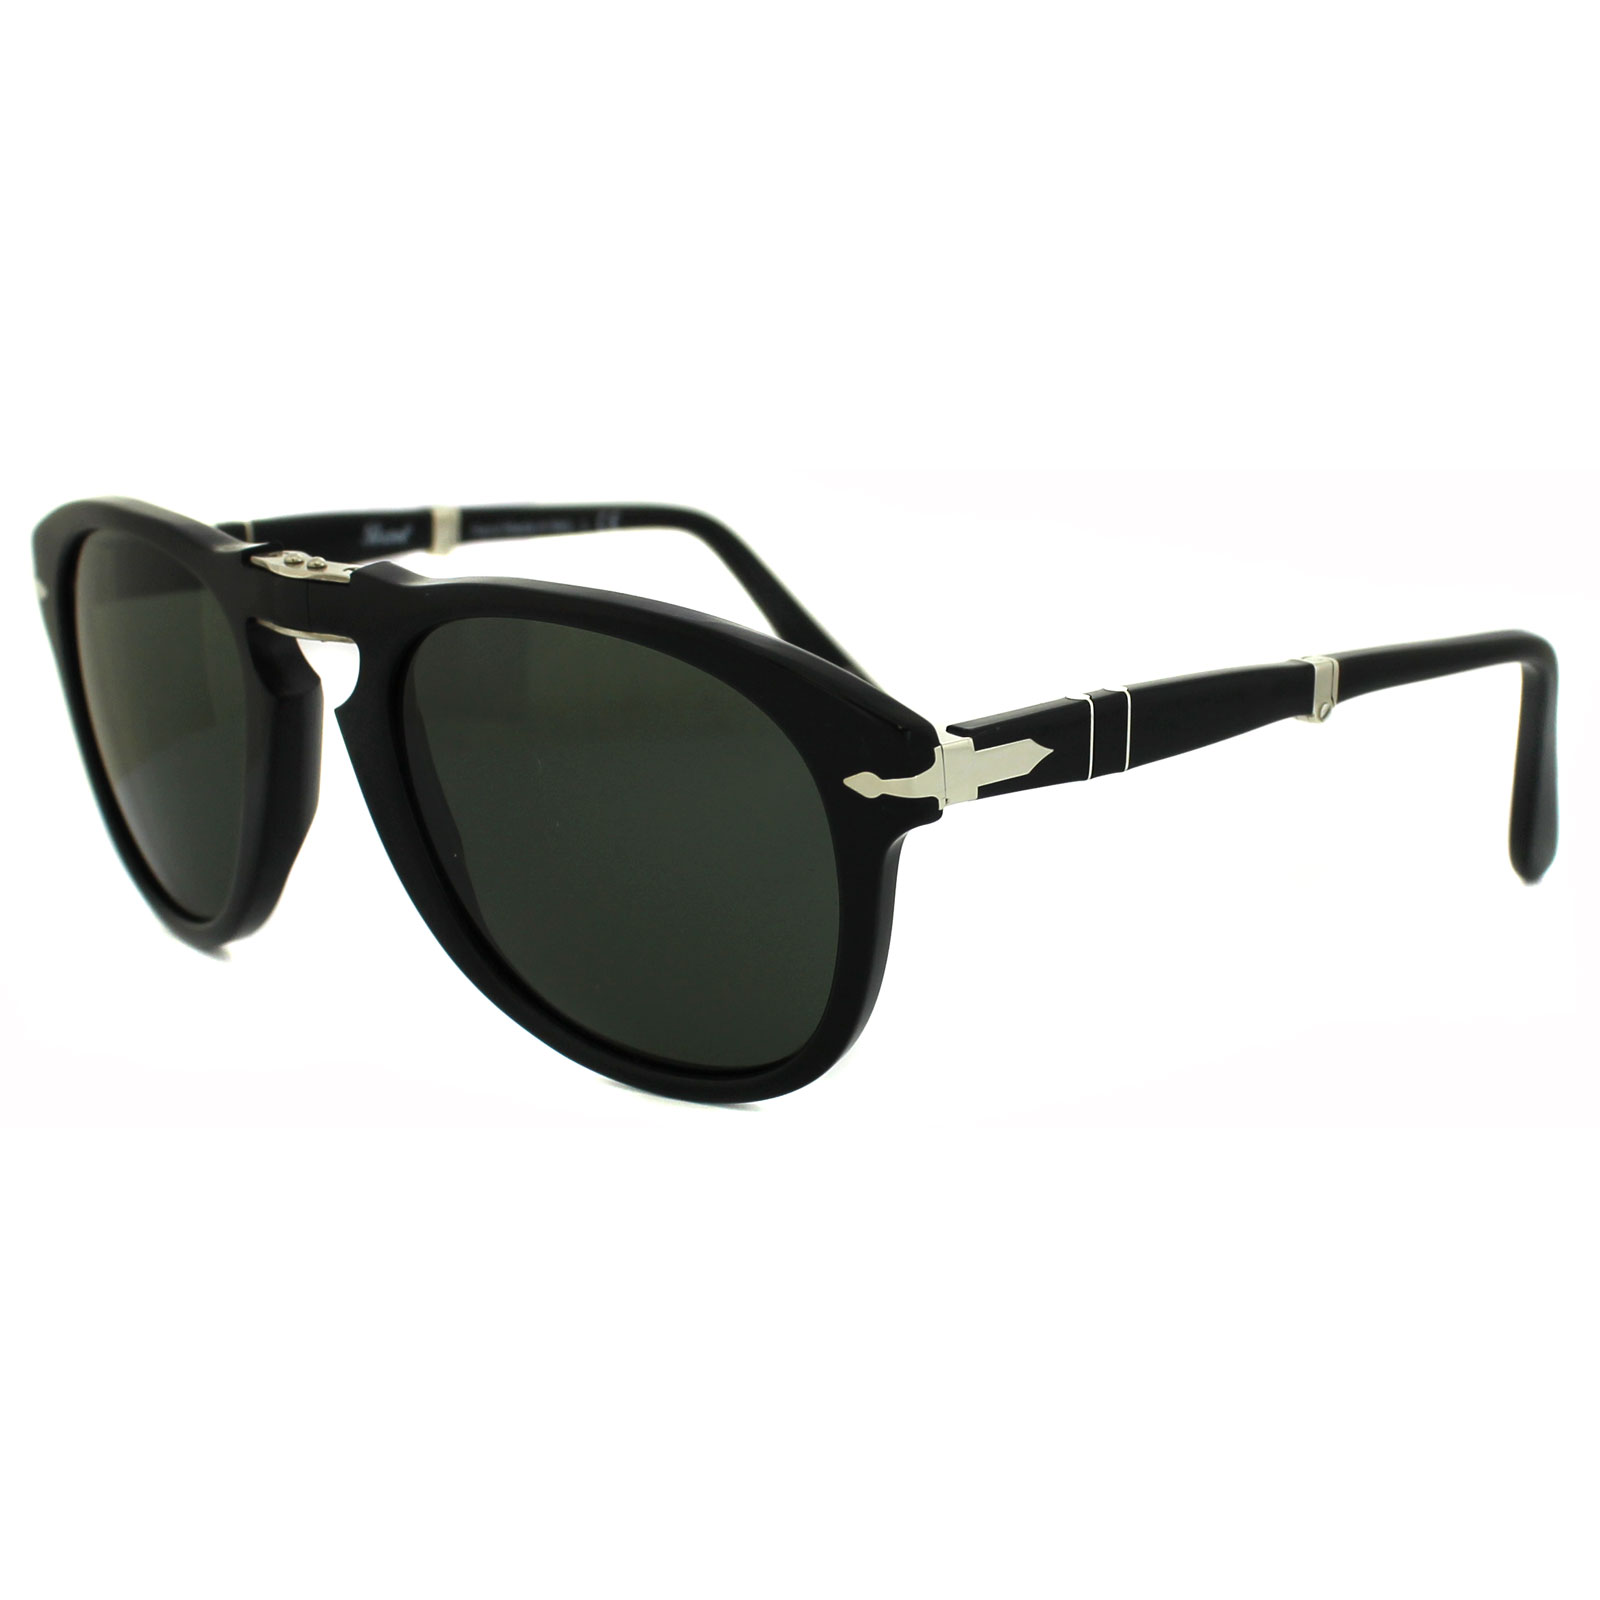 Steve Mcqueen Persol Sunglasses  persol sunglasses 714 95 31 black green folding steve mcqueen 52mm